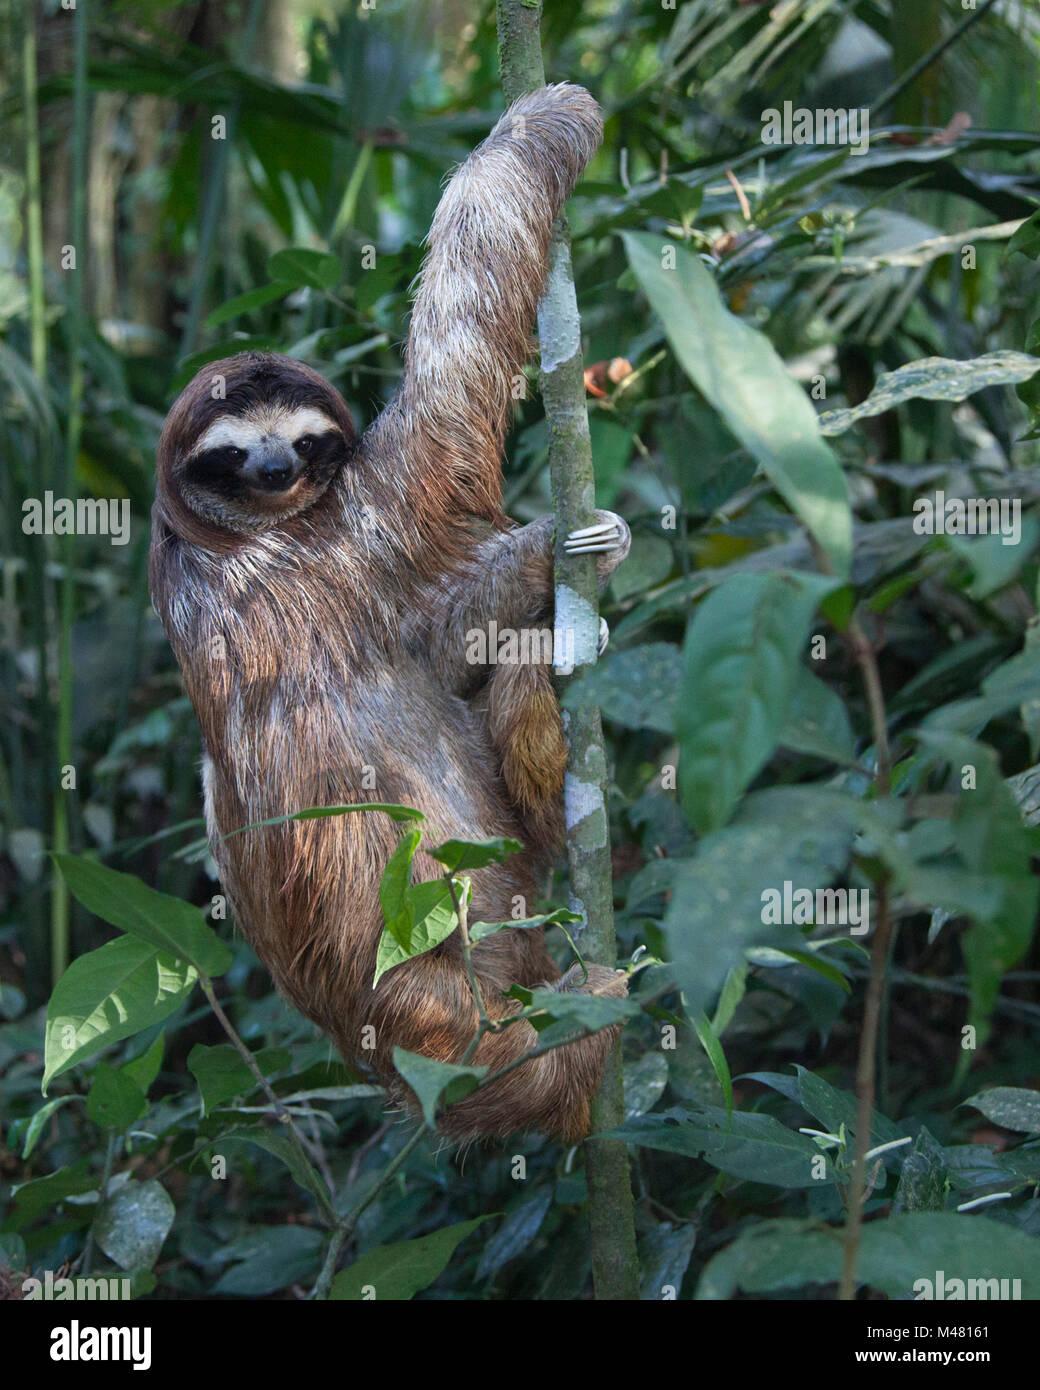 Brown-throated Three-toed Sloth (Bradypus variegatus) climbing tree in sloth sanctuary Stock Photo